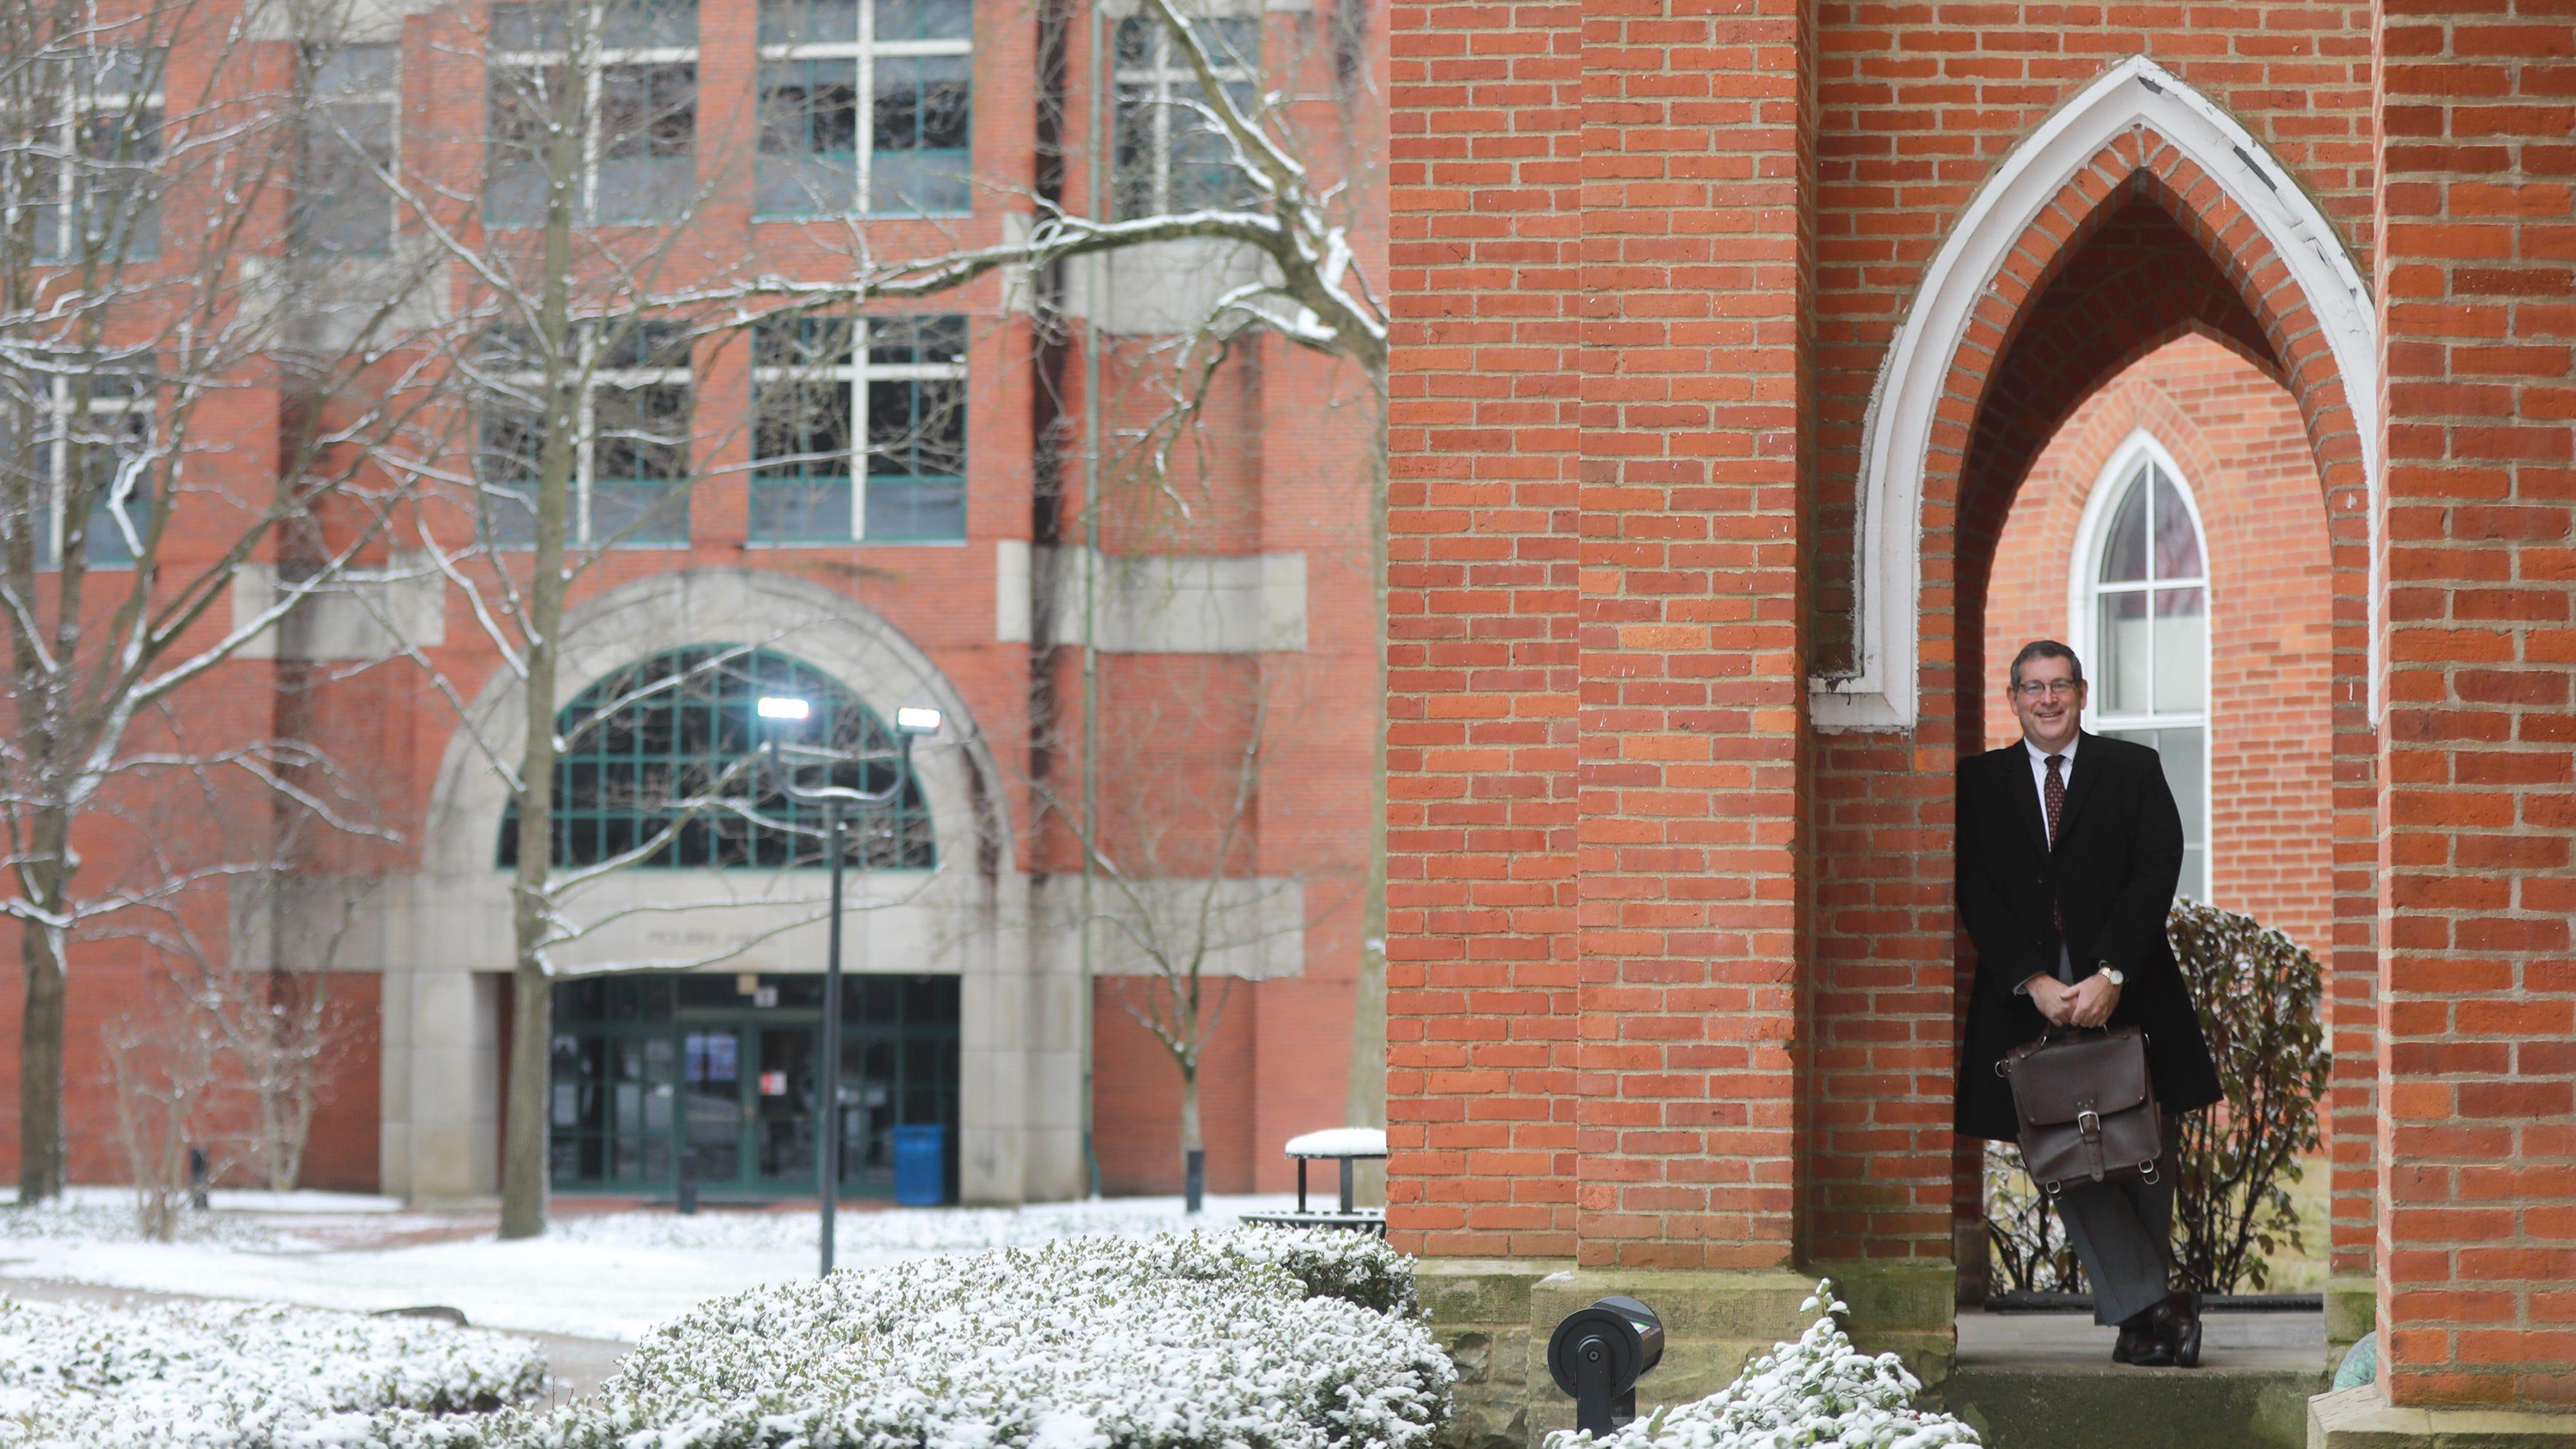 Ohio colleges offer mini semester as COVID prompts longer winter break